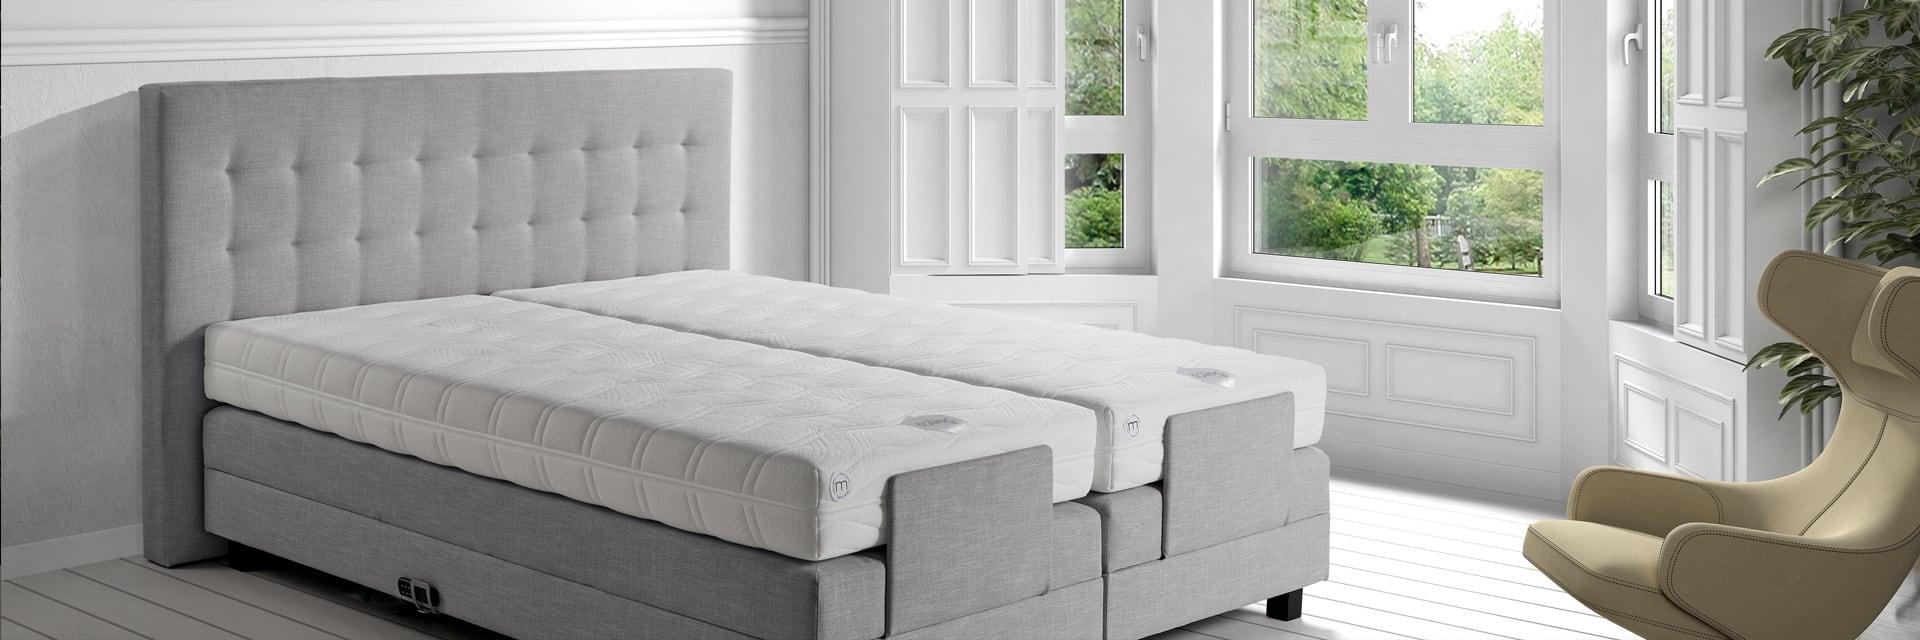 boxspringbetten beratung betten meyer olpe lennestadt. Black Bedroom Furniture Sets. Home Design Ideas